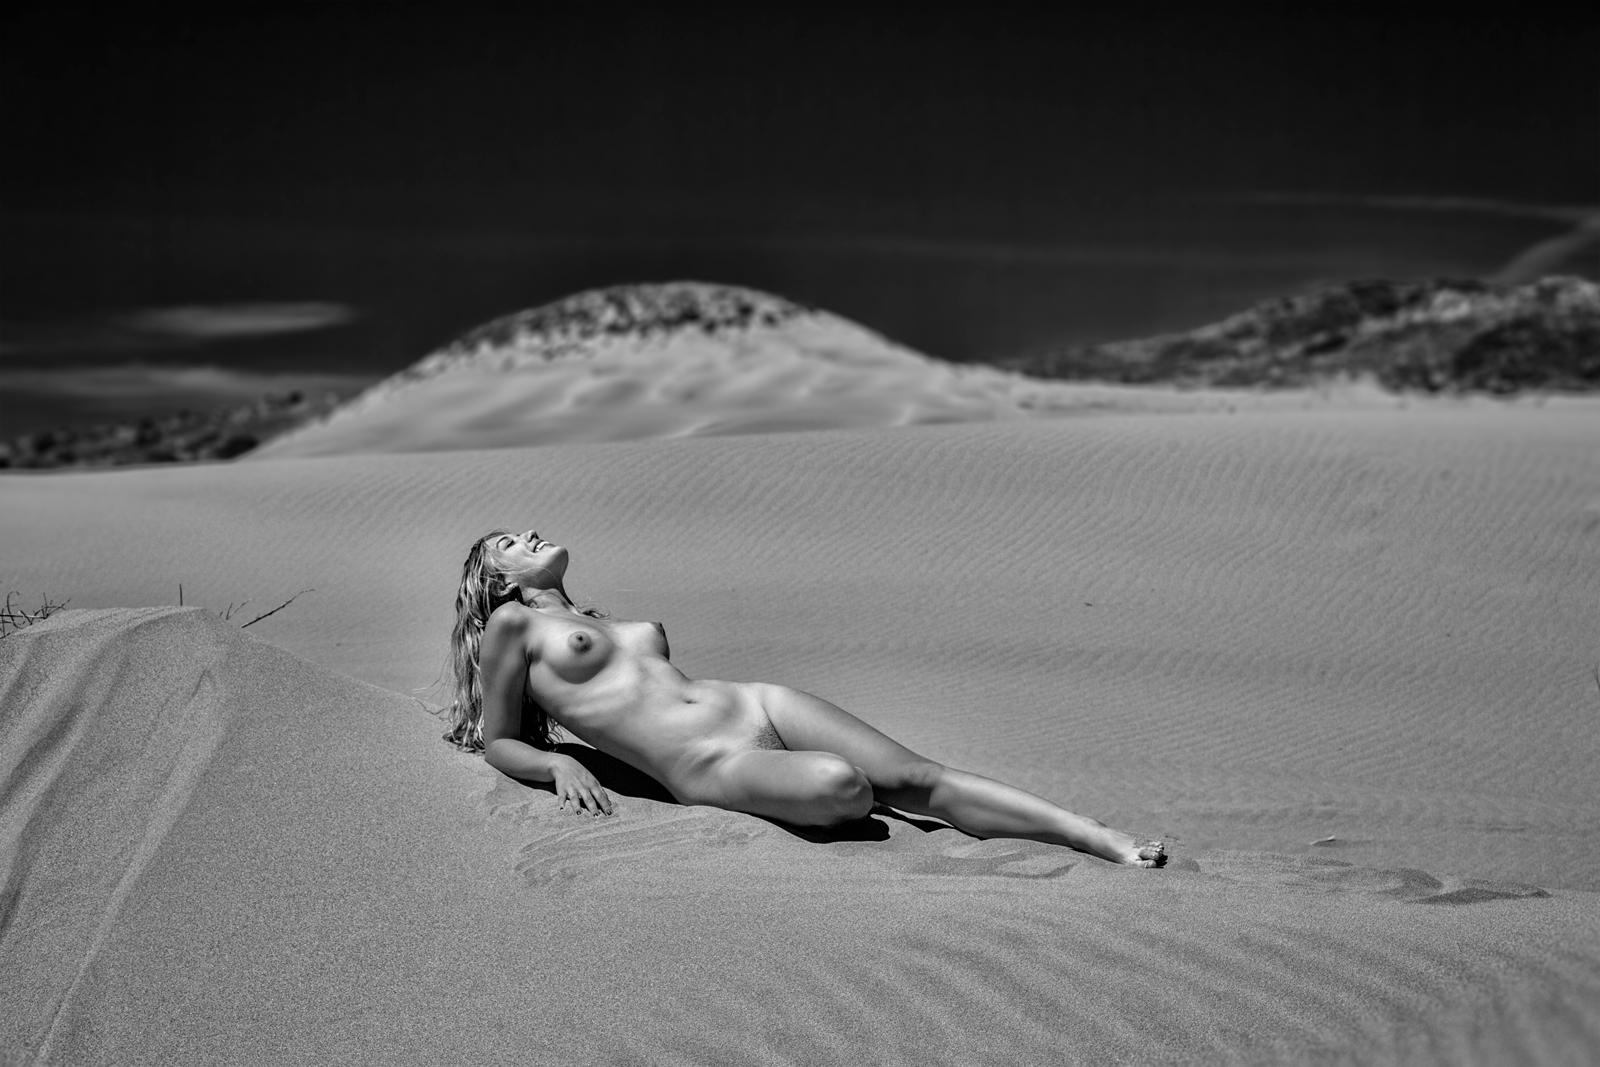 Nude favourites by Vertigo247 on DeviantArt